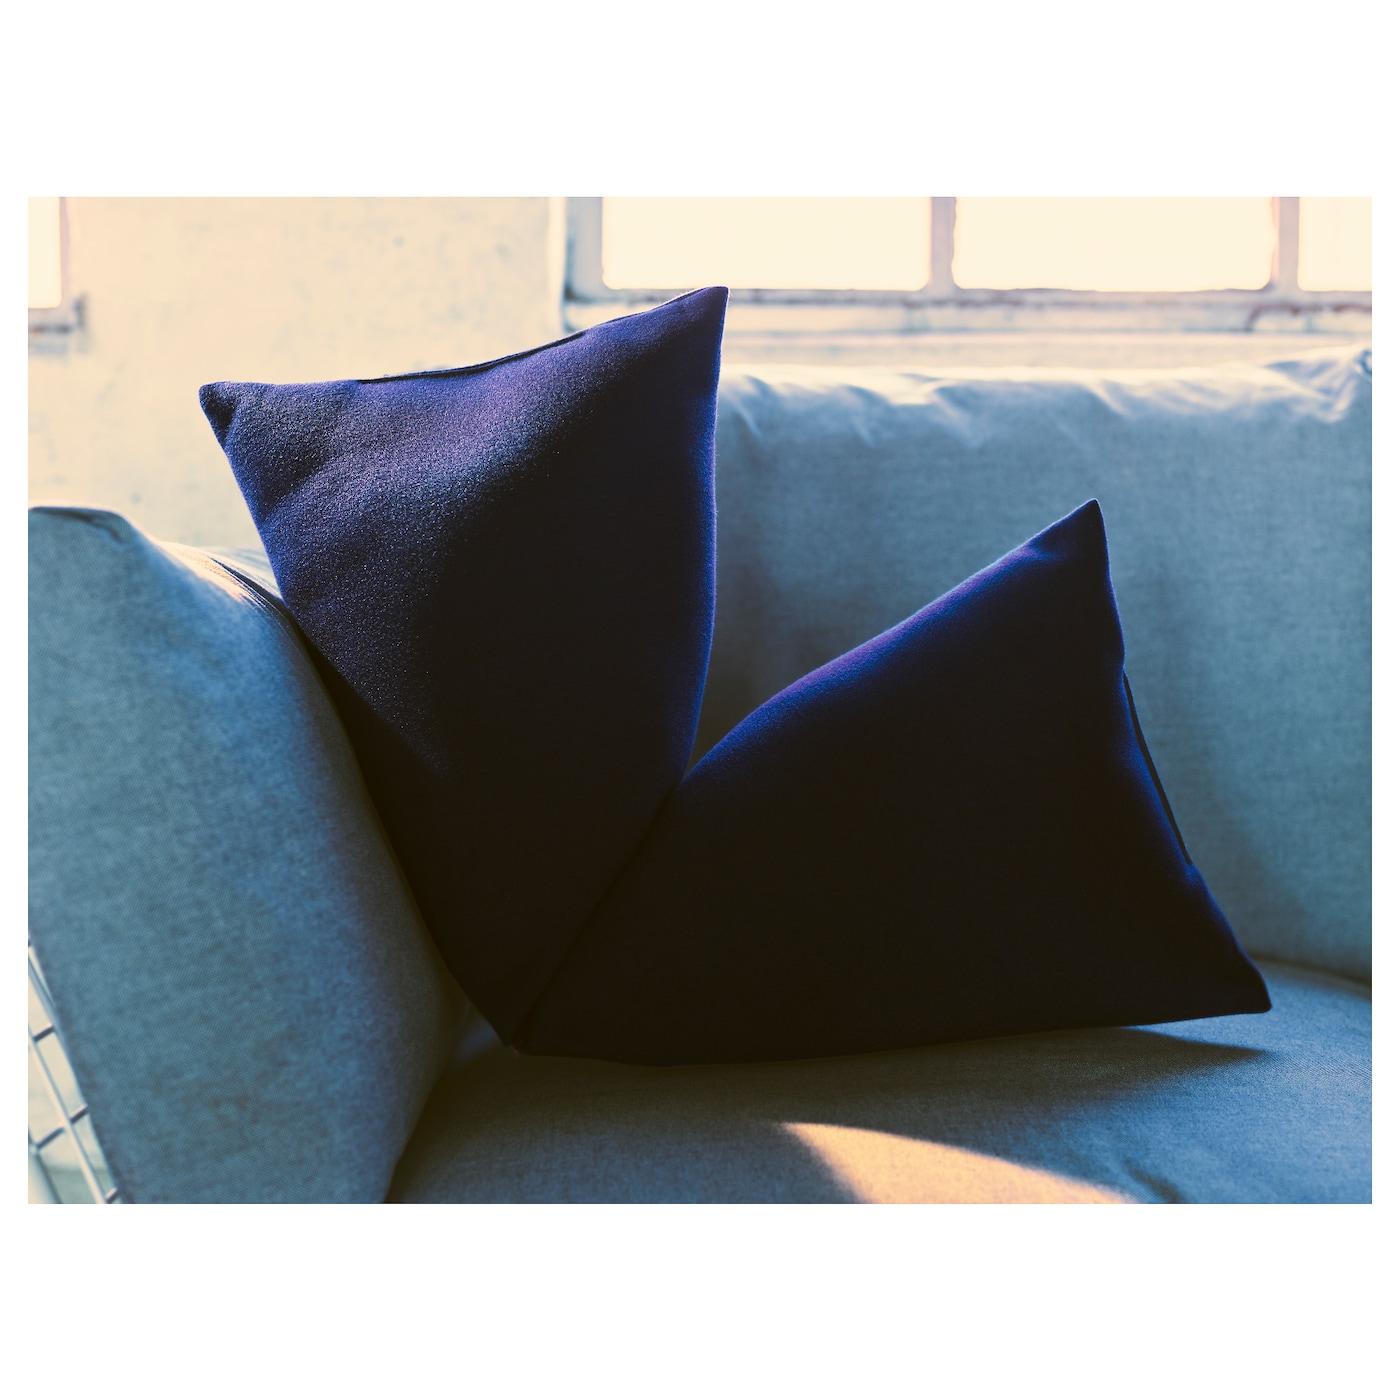 ikea ps 2017 cushion dark blue 80x30 cm ikea. Black Bedroom Furniture Sets. Home Design Ideas